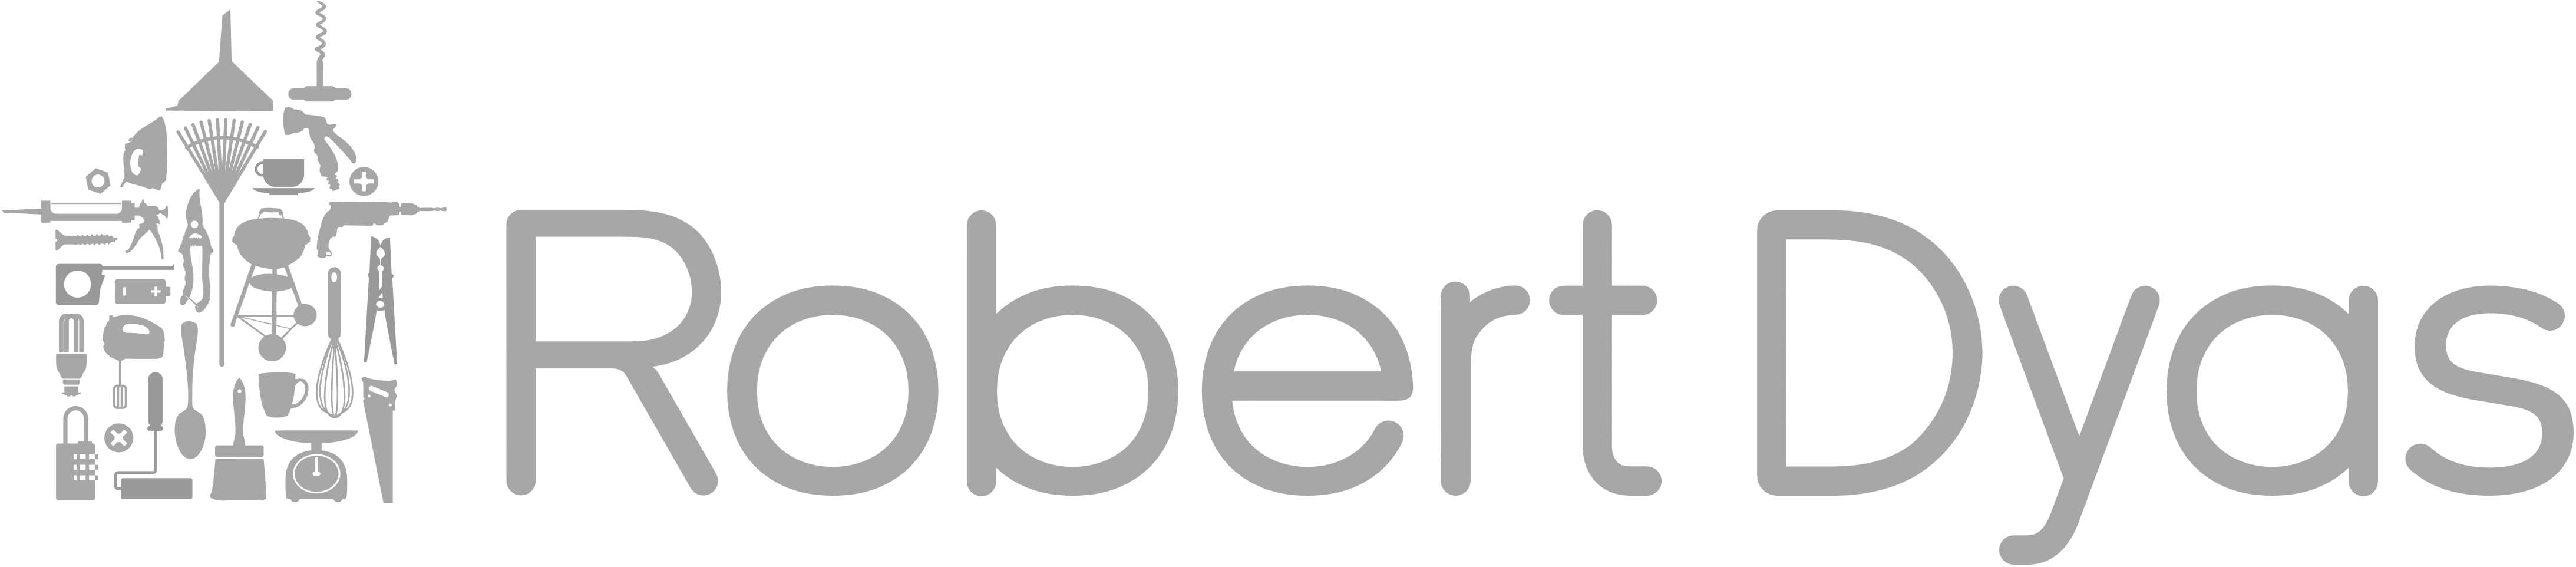 Magecart Attack - Robert Dyas logo